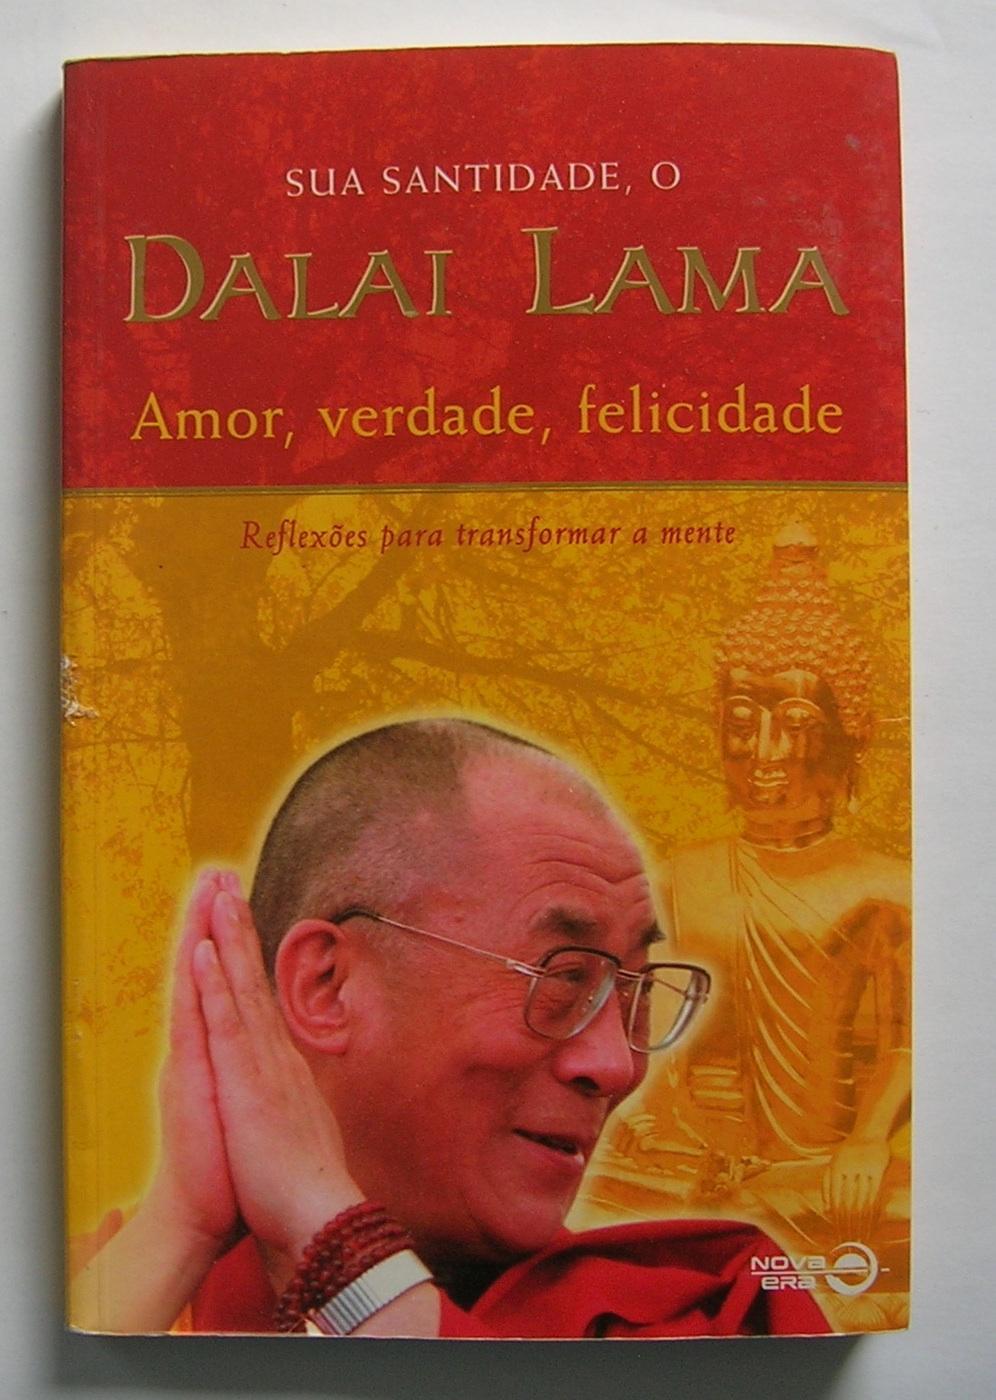 Amore, verdade, felicidade: Reflexoes para transformar a mente. - sua santidade, o Dalai Lama.